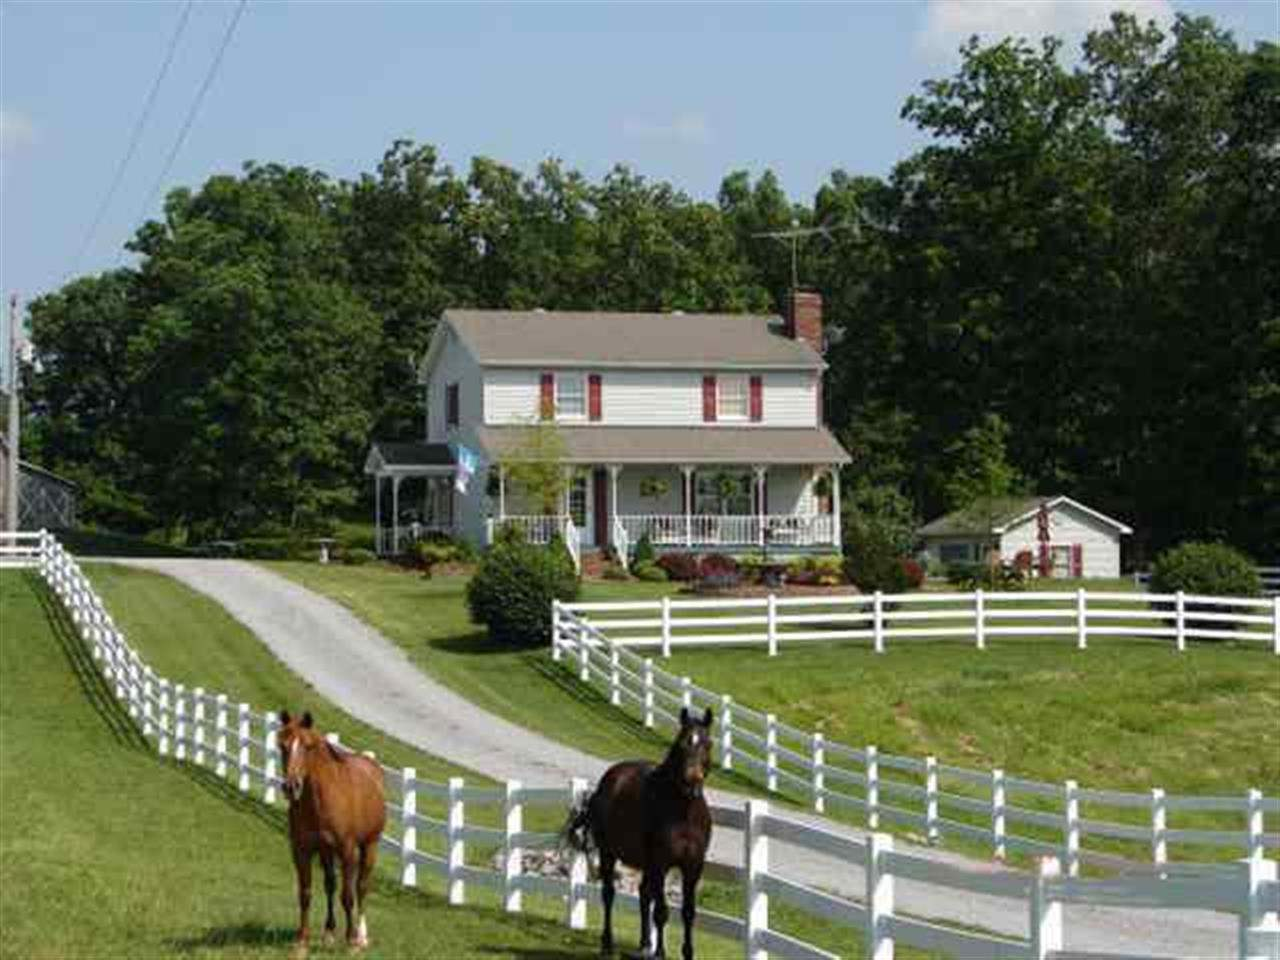 Real Estate for Sale, ListingId: 27633528, Smithland,KY42081